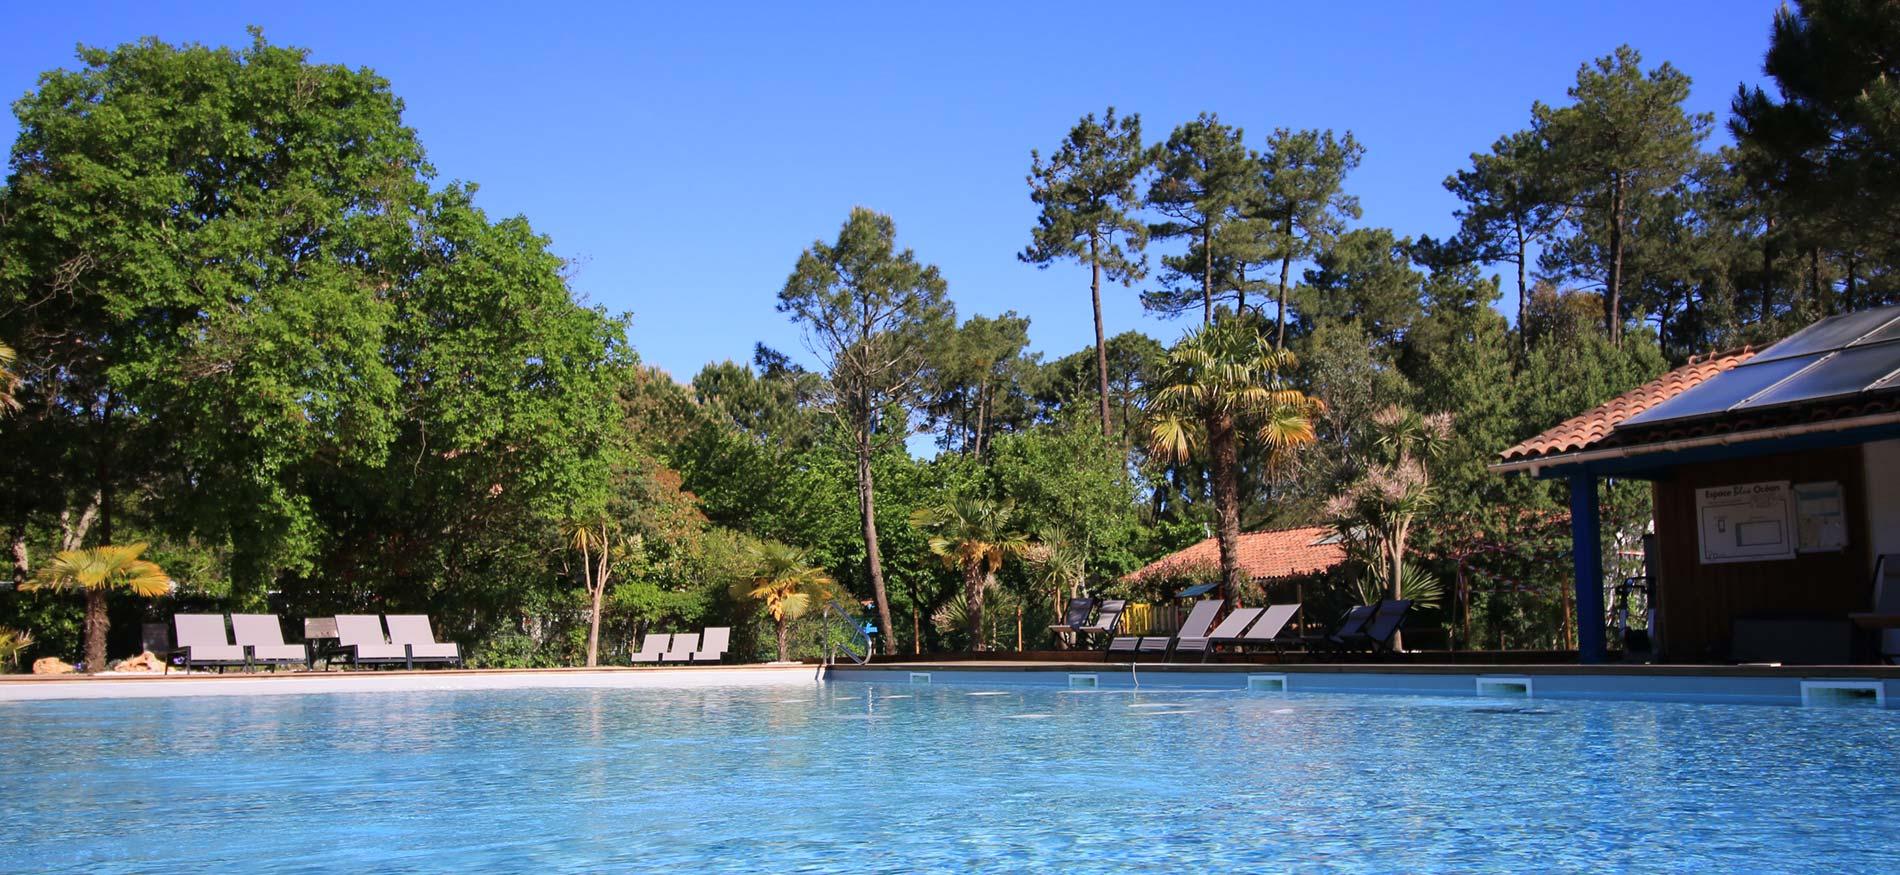 Piscine chauffée du Green Resort